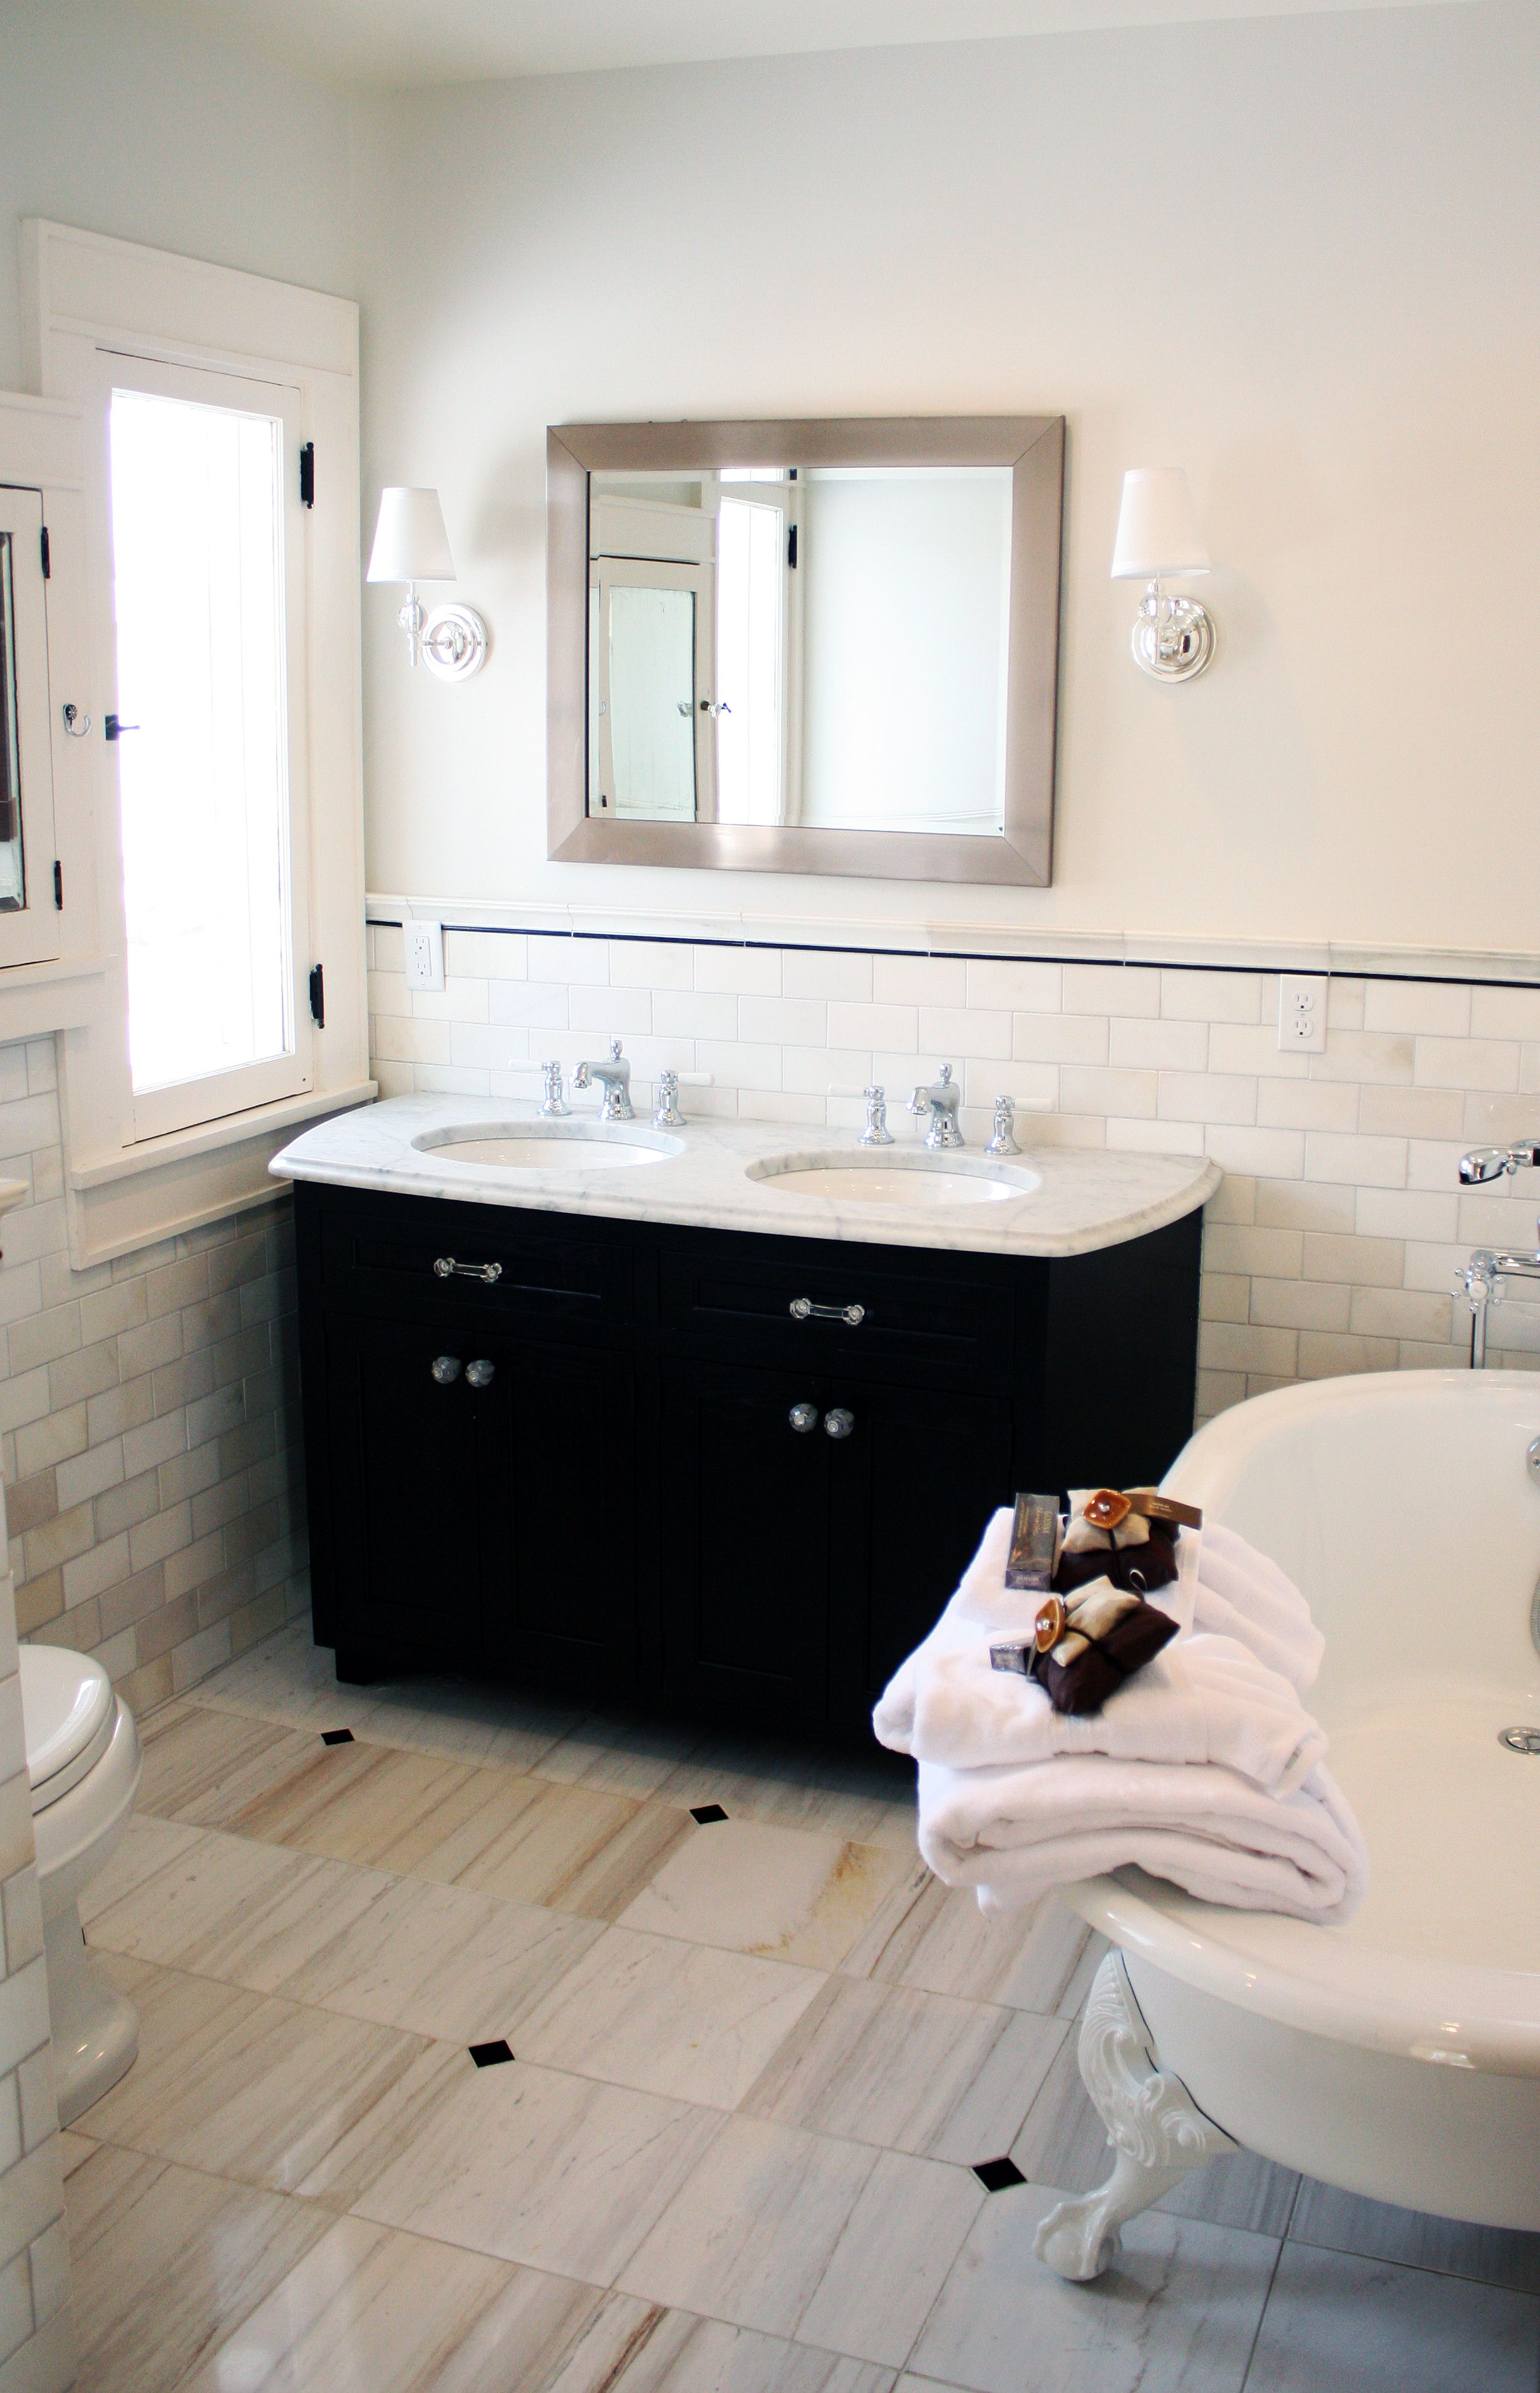 Pin By The Tile Shop On Bathroom Tile Rehab Addict Nicole Curtis Nicole Curtis Rehab Addict